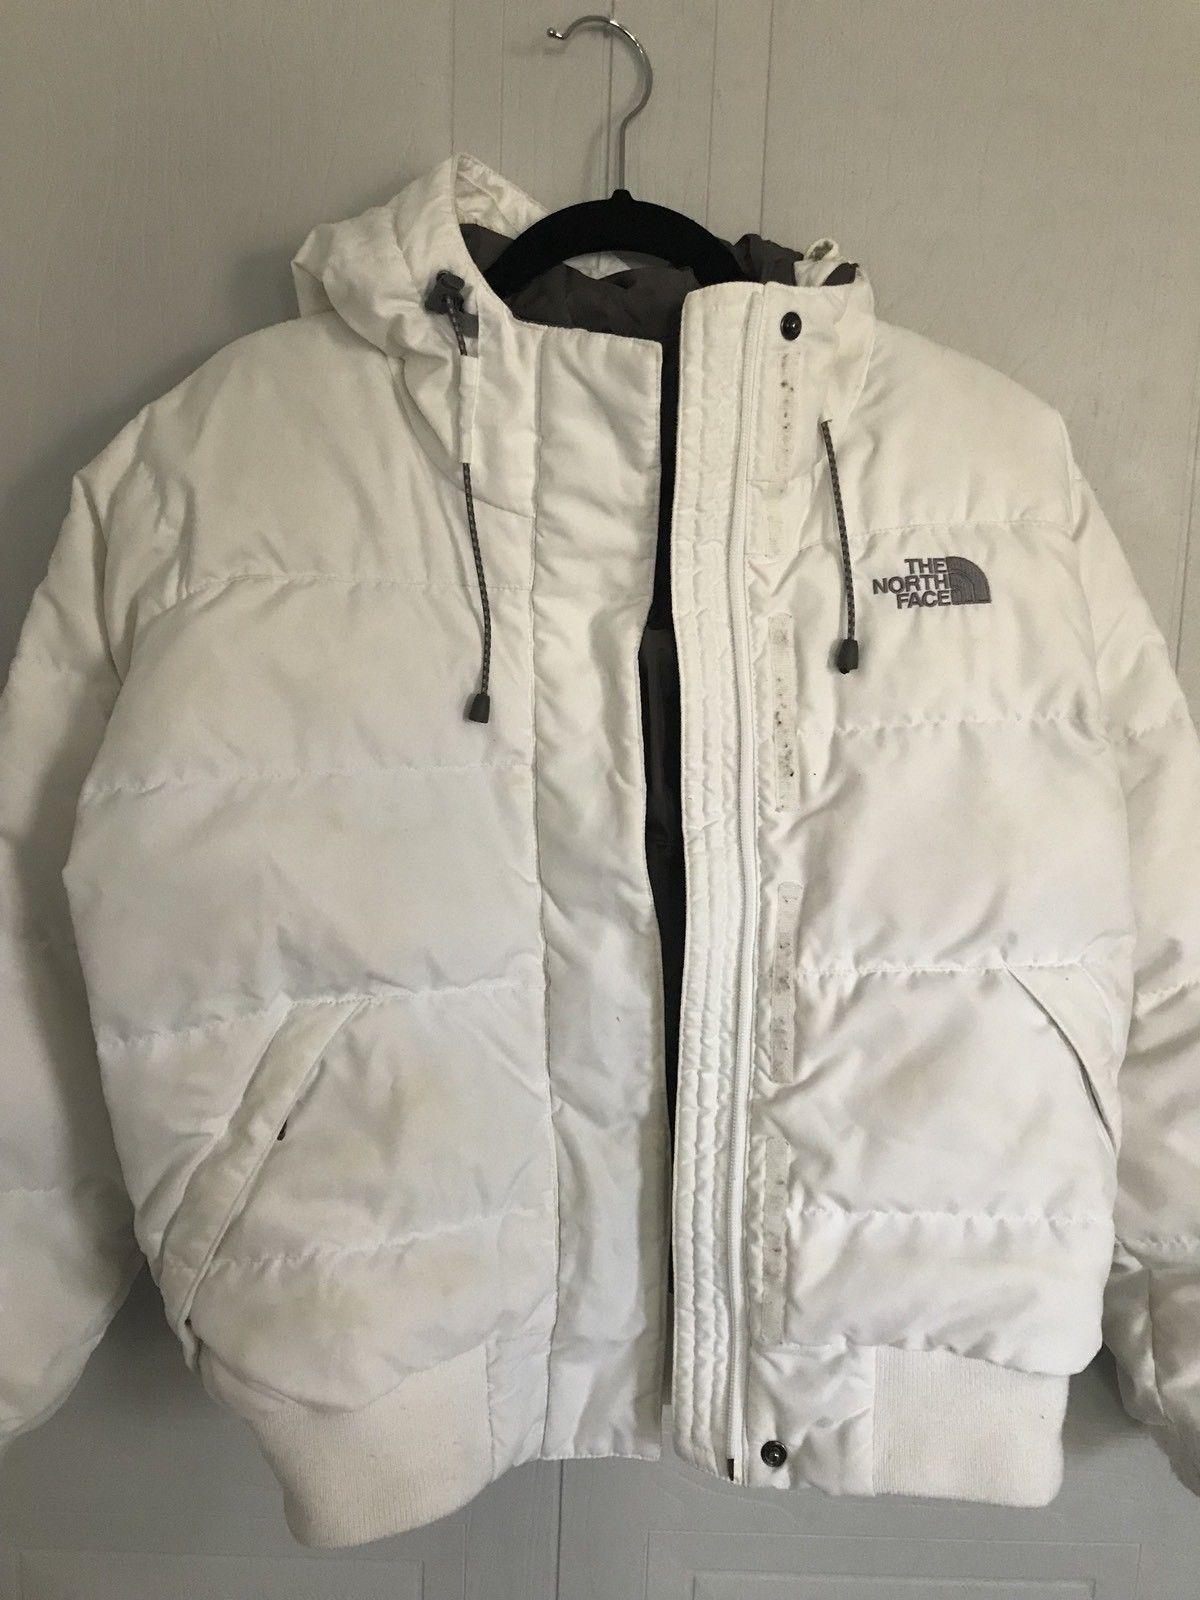 60 00 Women S White North Face Winter Puffer Coat Ski Jacket Puffy Small Womens White North Face Winter Winter Puffer Coat Puffer Coat Ski Jacket [ 1600 x 1200 Pixel ]